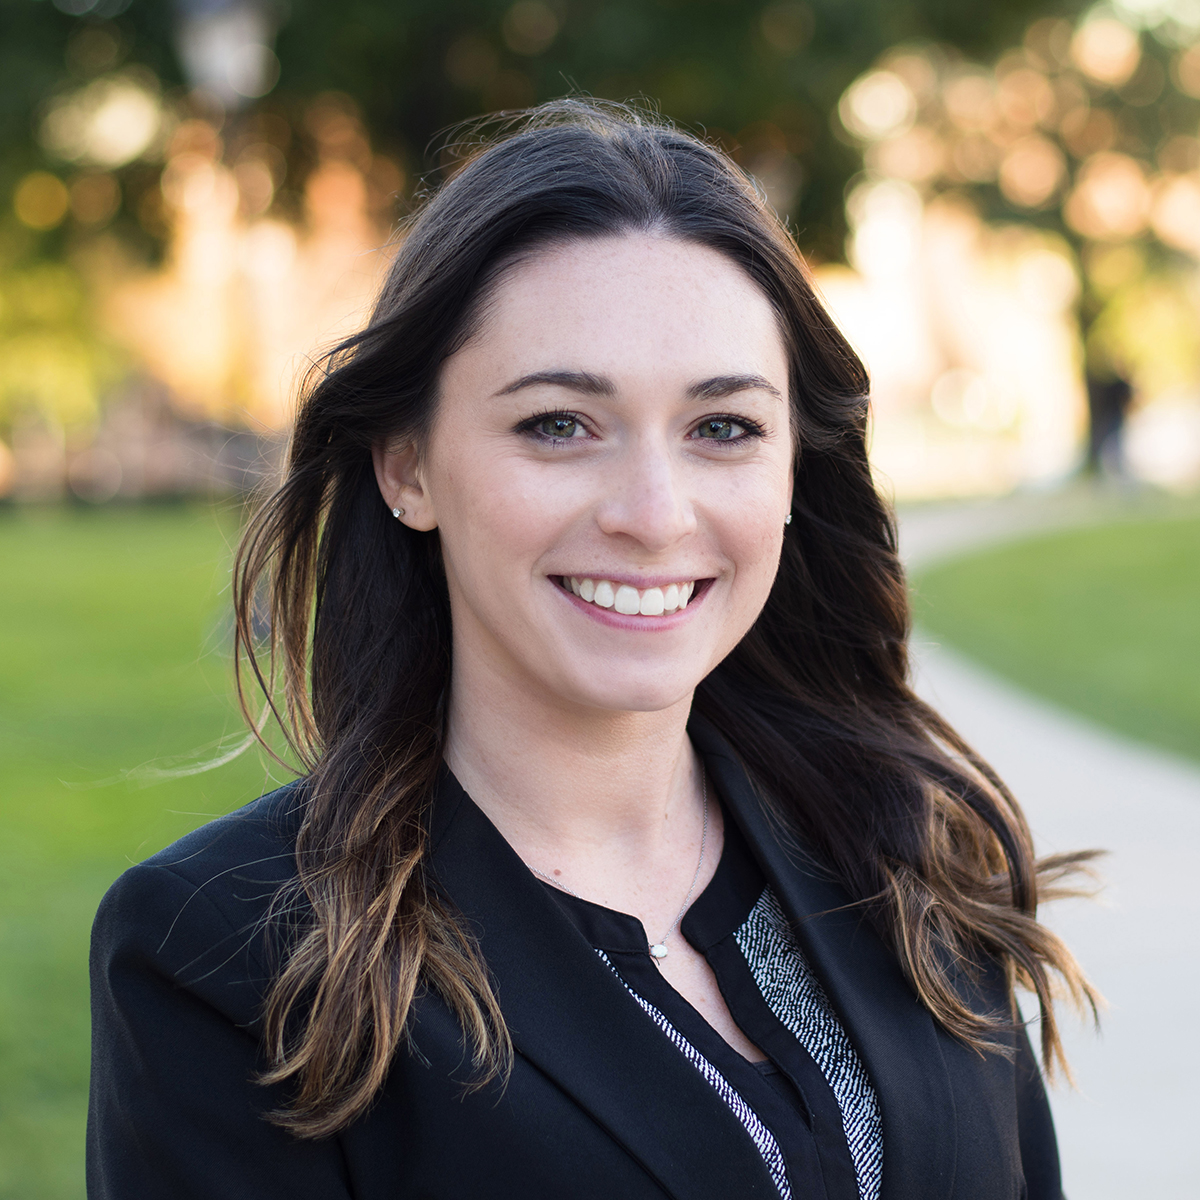 Acuitas Creates Digital Content Position, Hires Megan McFarlane as Manager